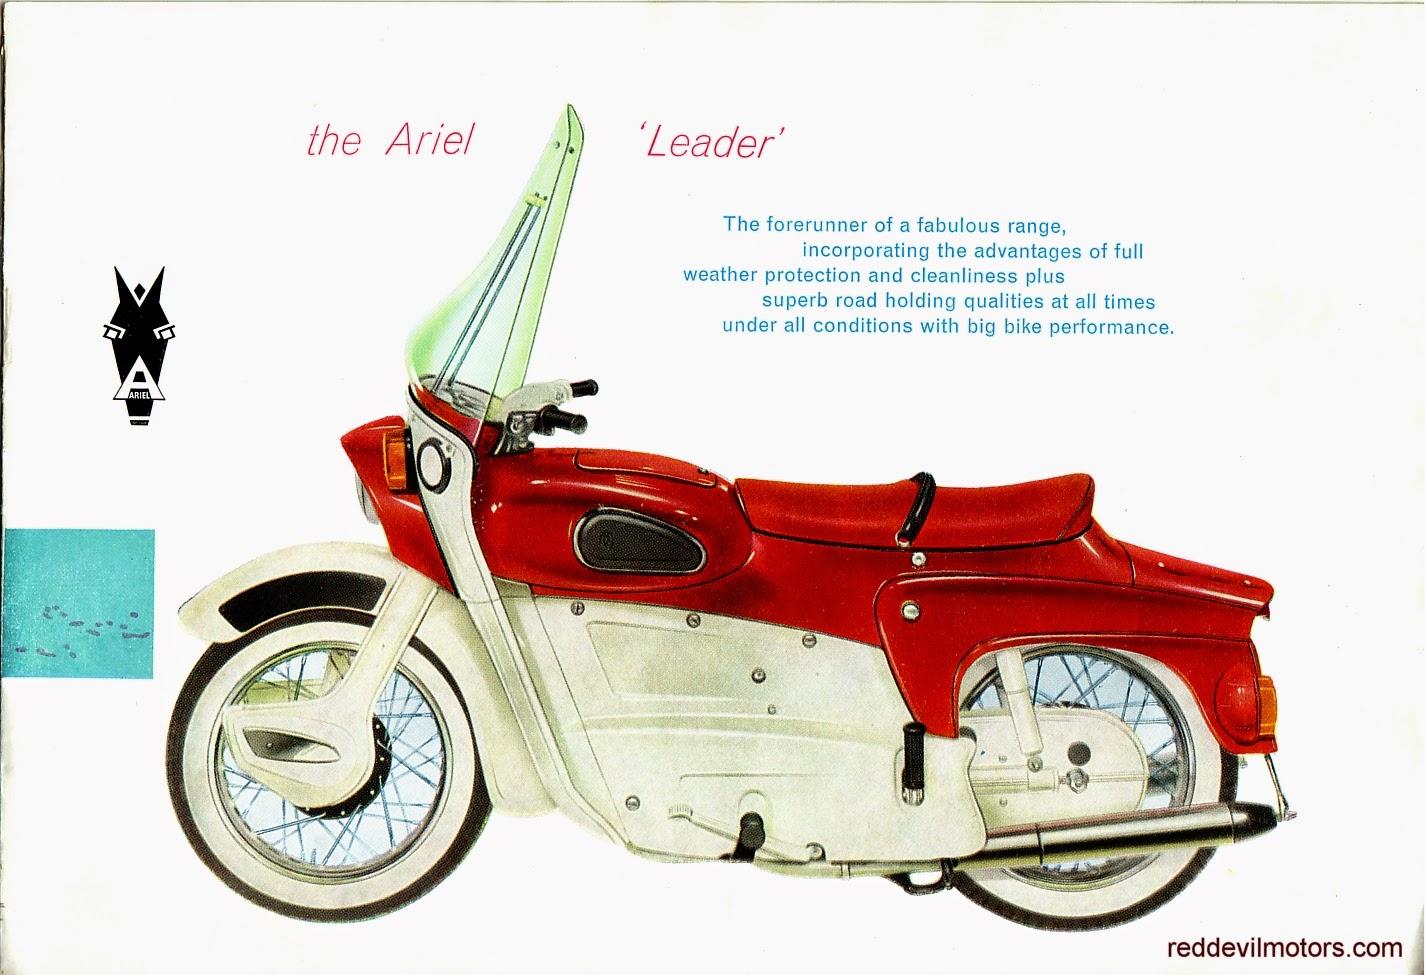 Ariel Arrow and Leader brochure page 2